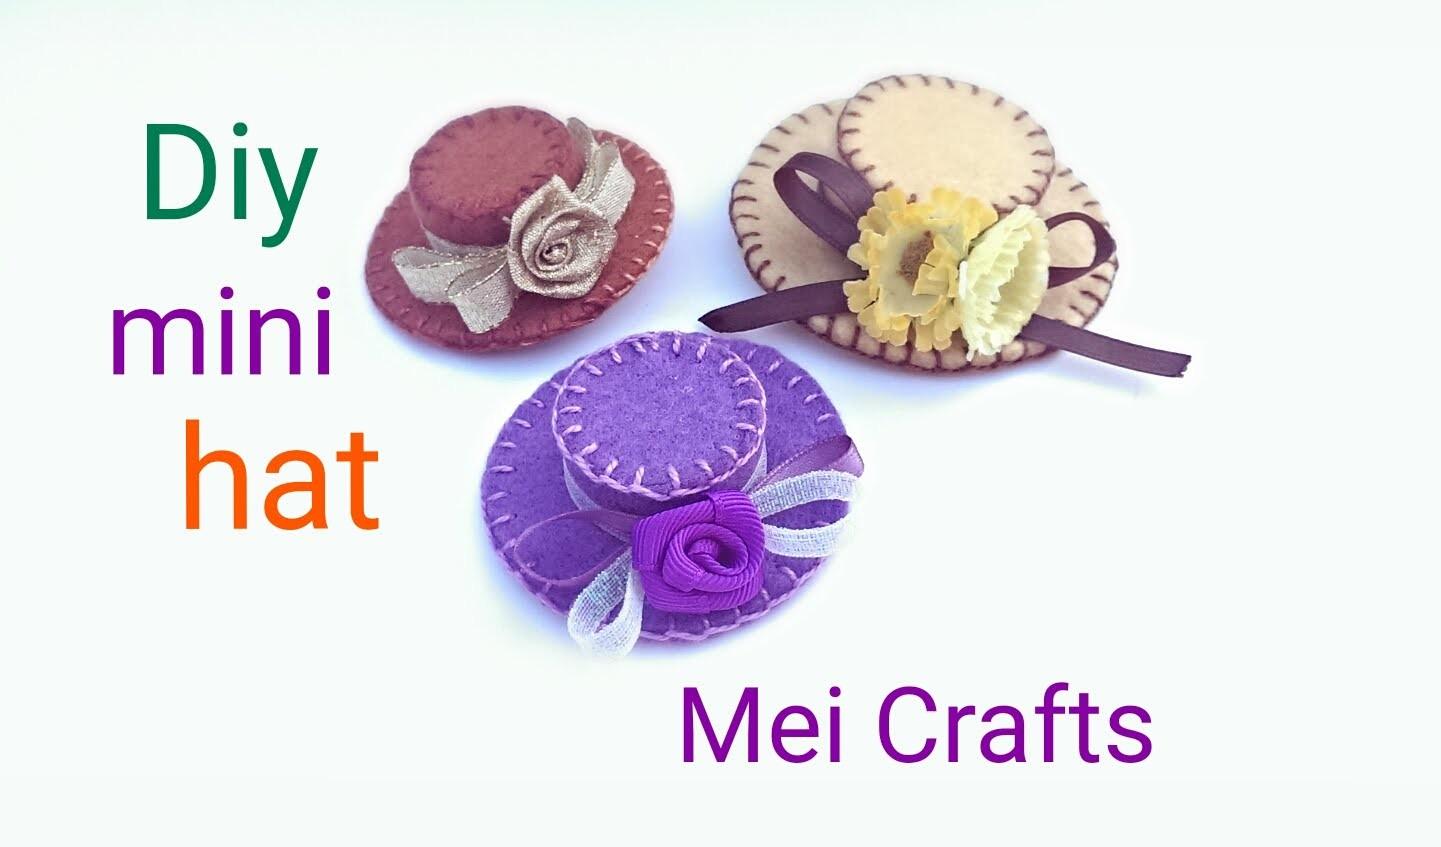 Diy: how to make a mini hat